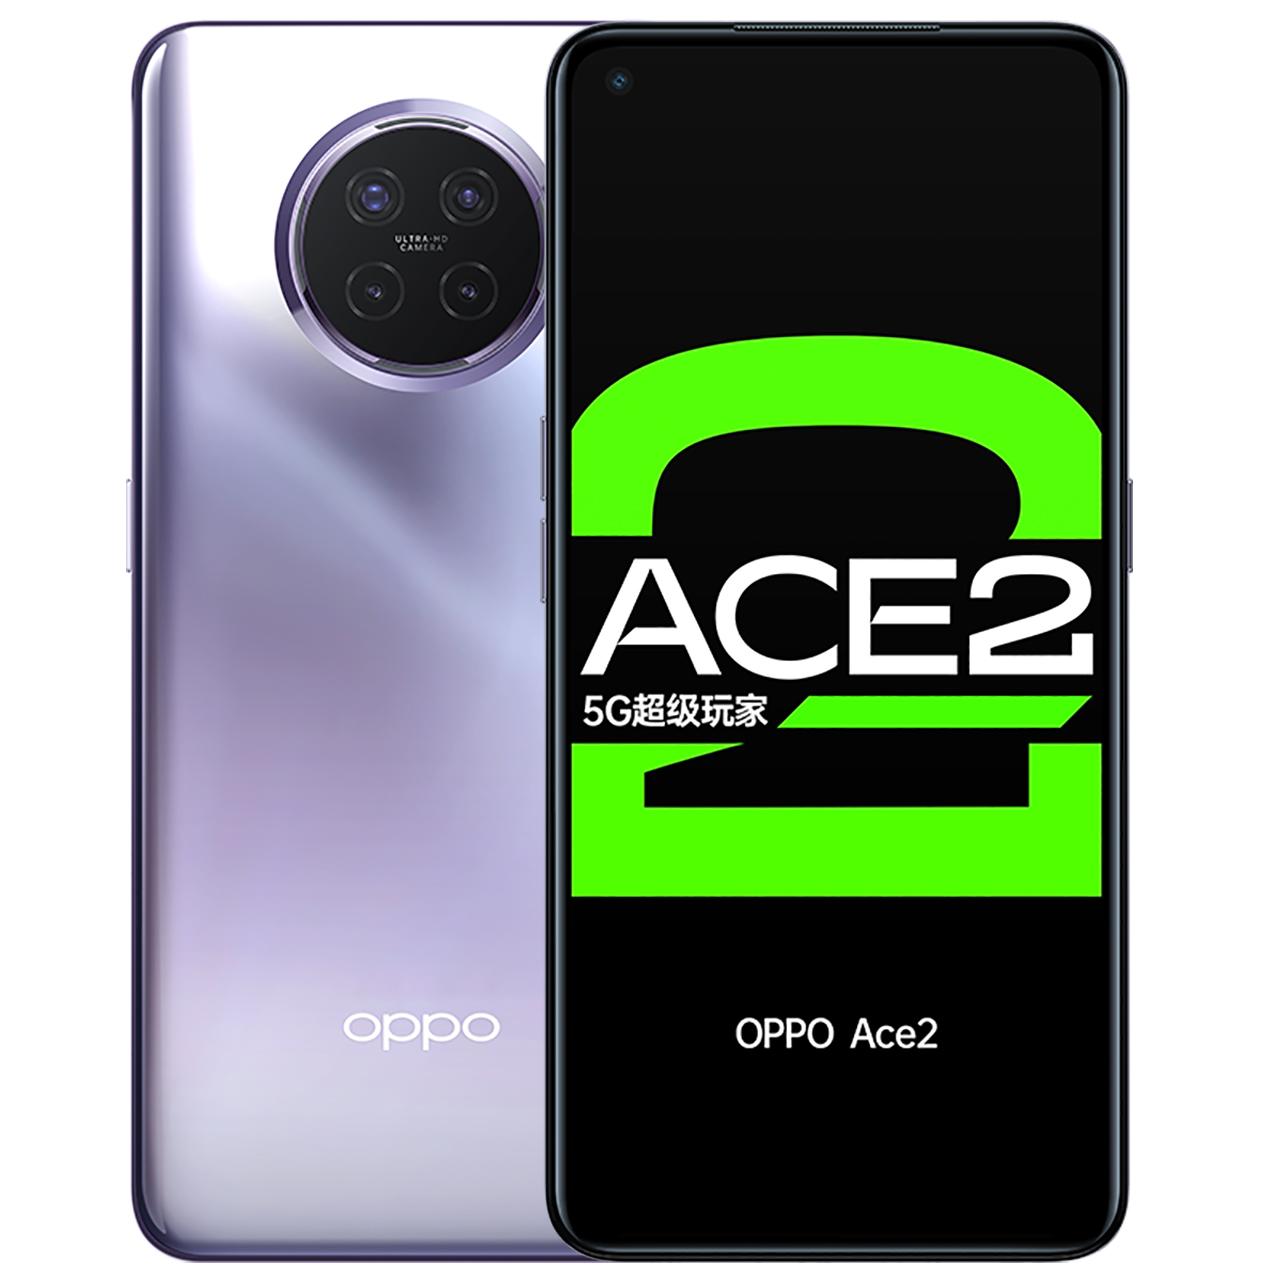 oppoace2 全面屏闪充游戏智能手机 865 全网通骁龙 5G 双模 Ace2 OPPO